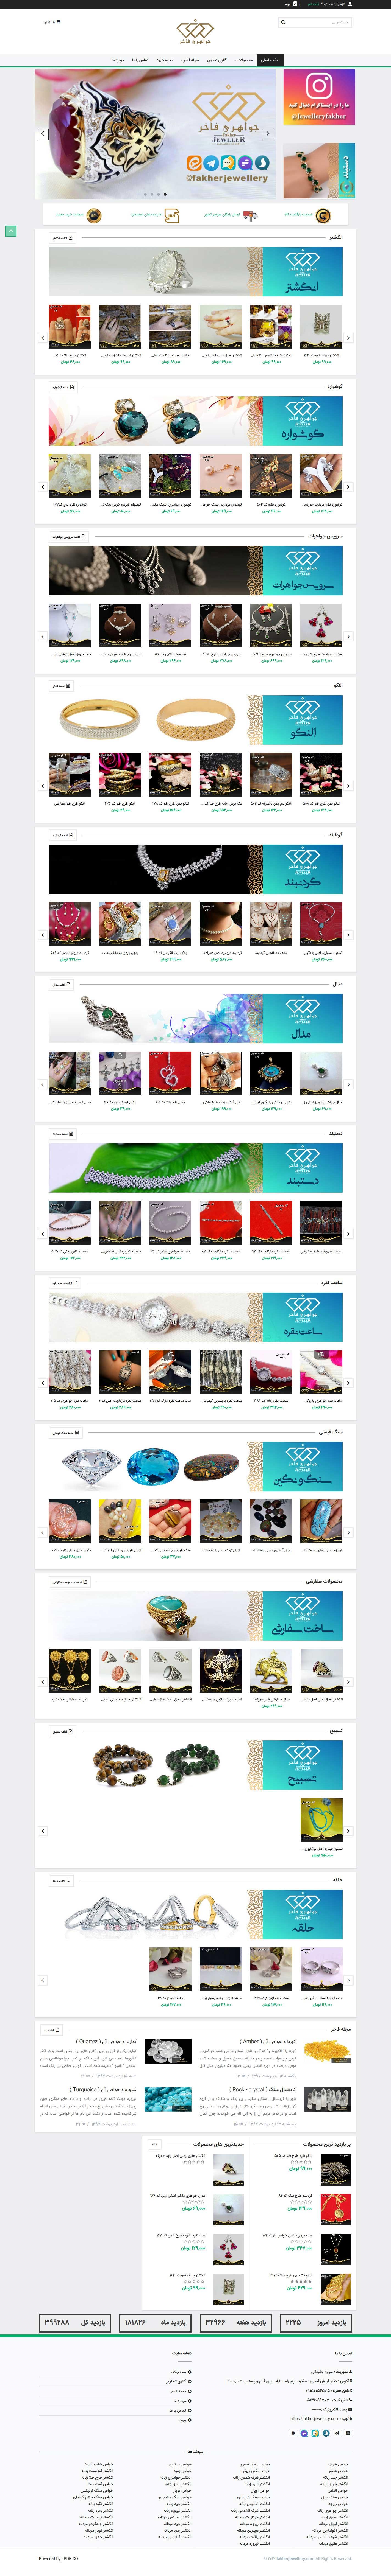 طراحی سایت جواهری فاخر